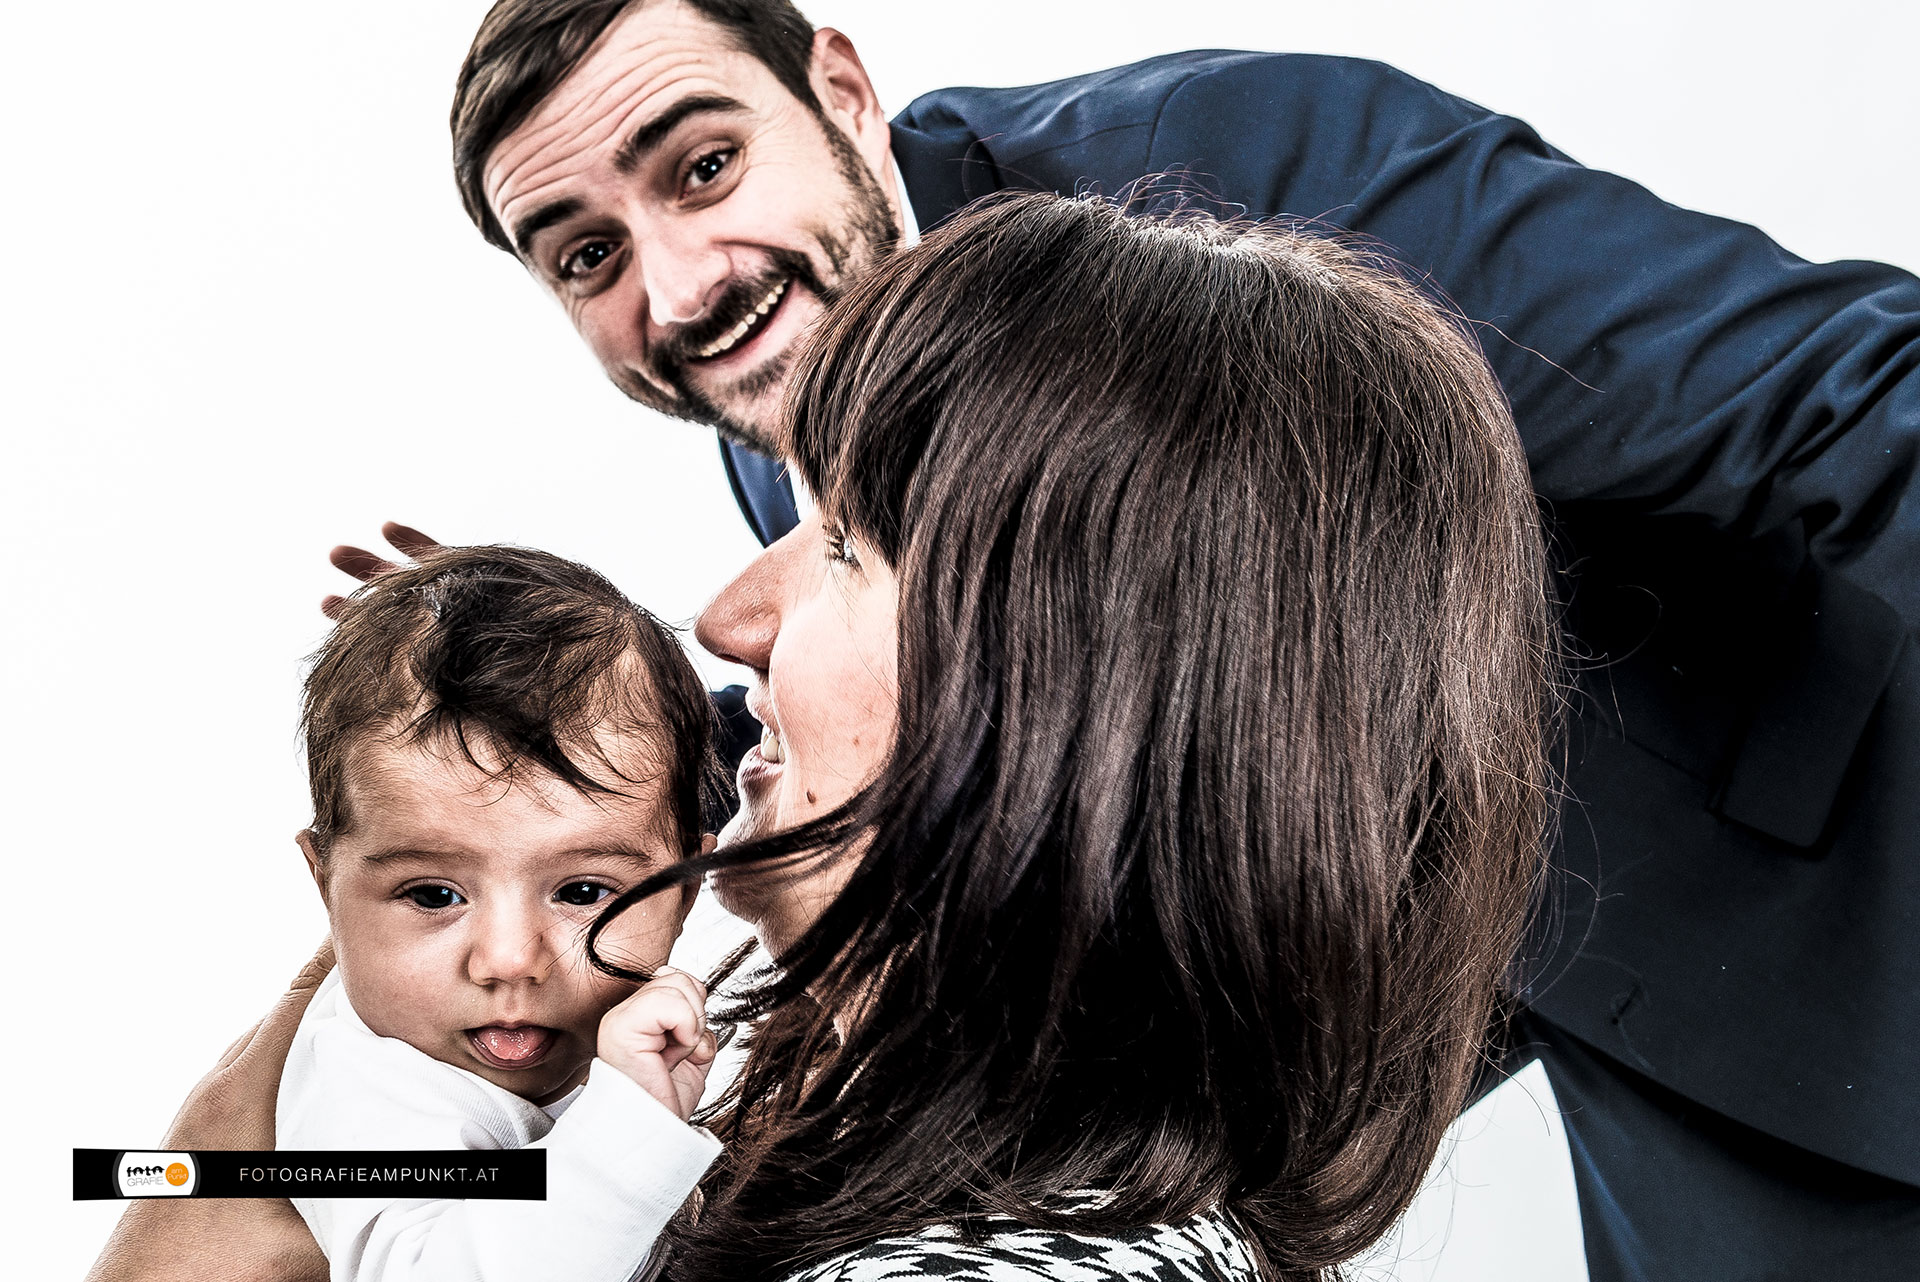 Familie - Fotografie am Punkt